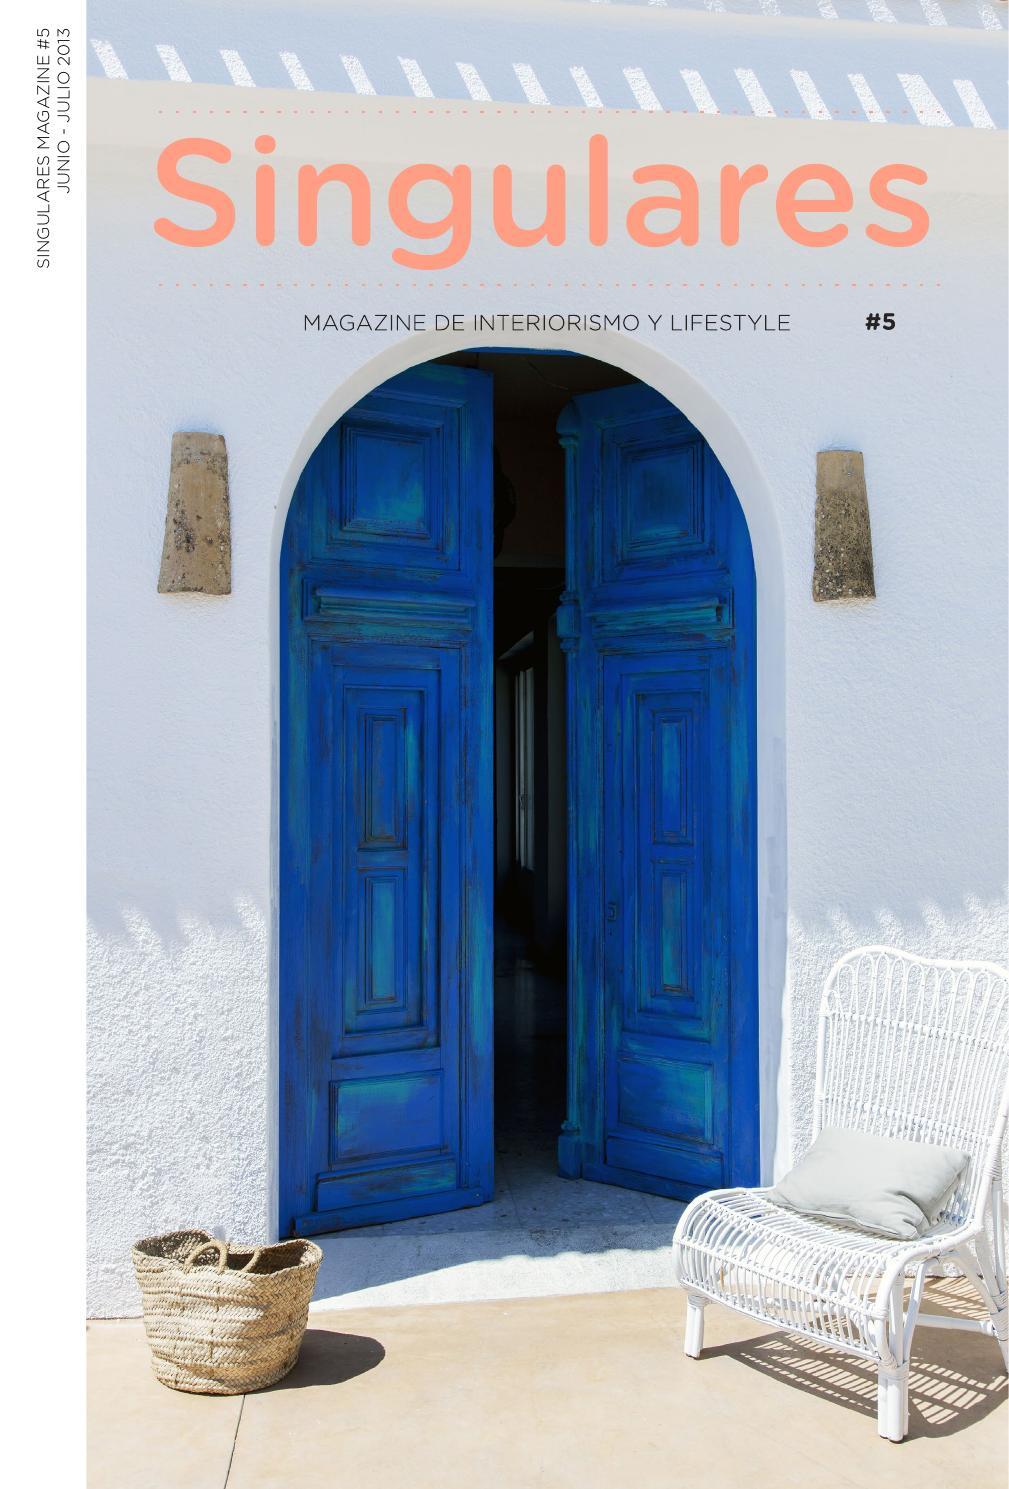 Singularesmag 5 by singulares magazine issuu for Almacenes poveda